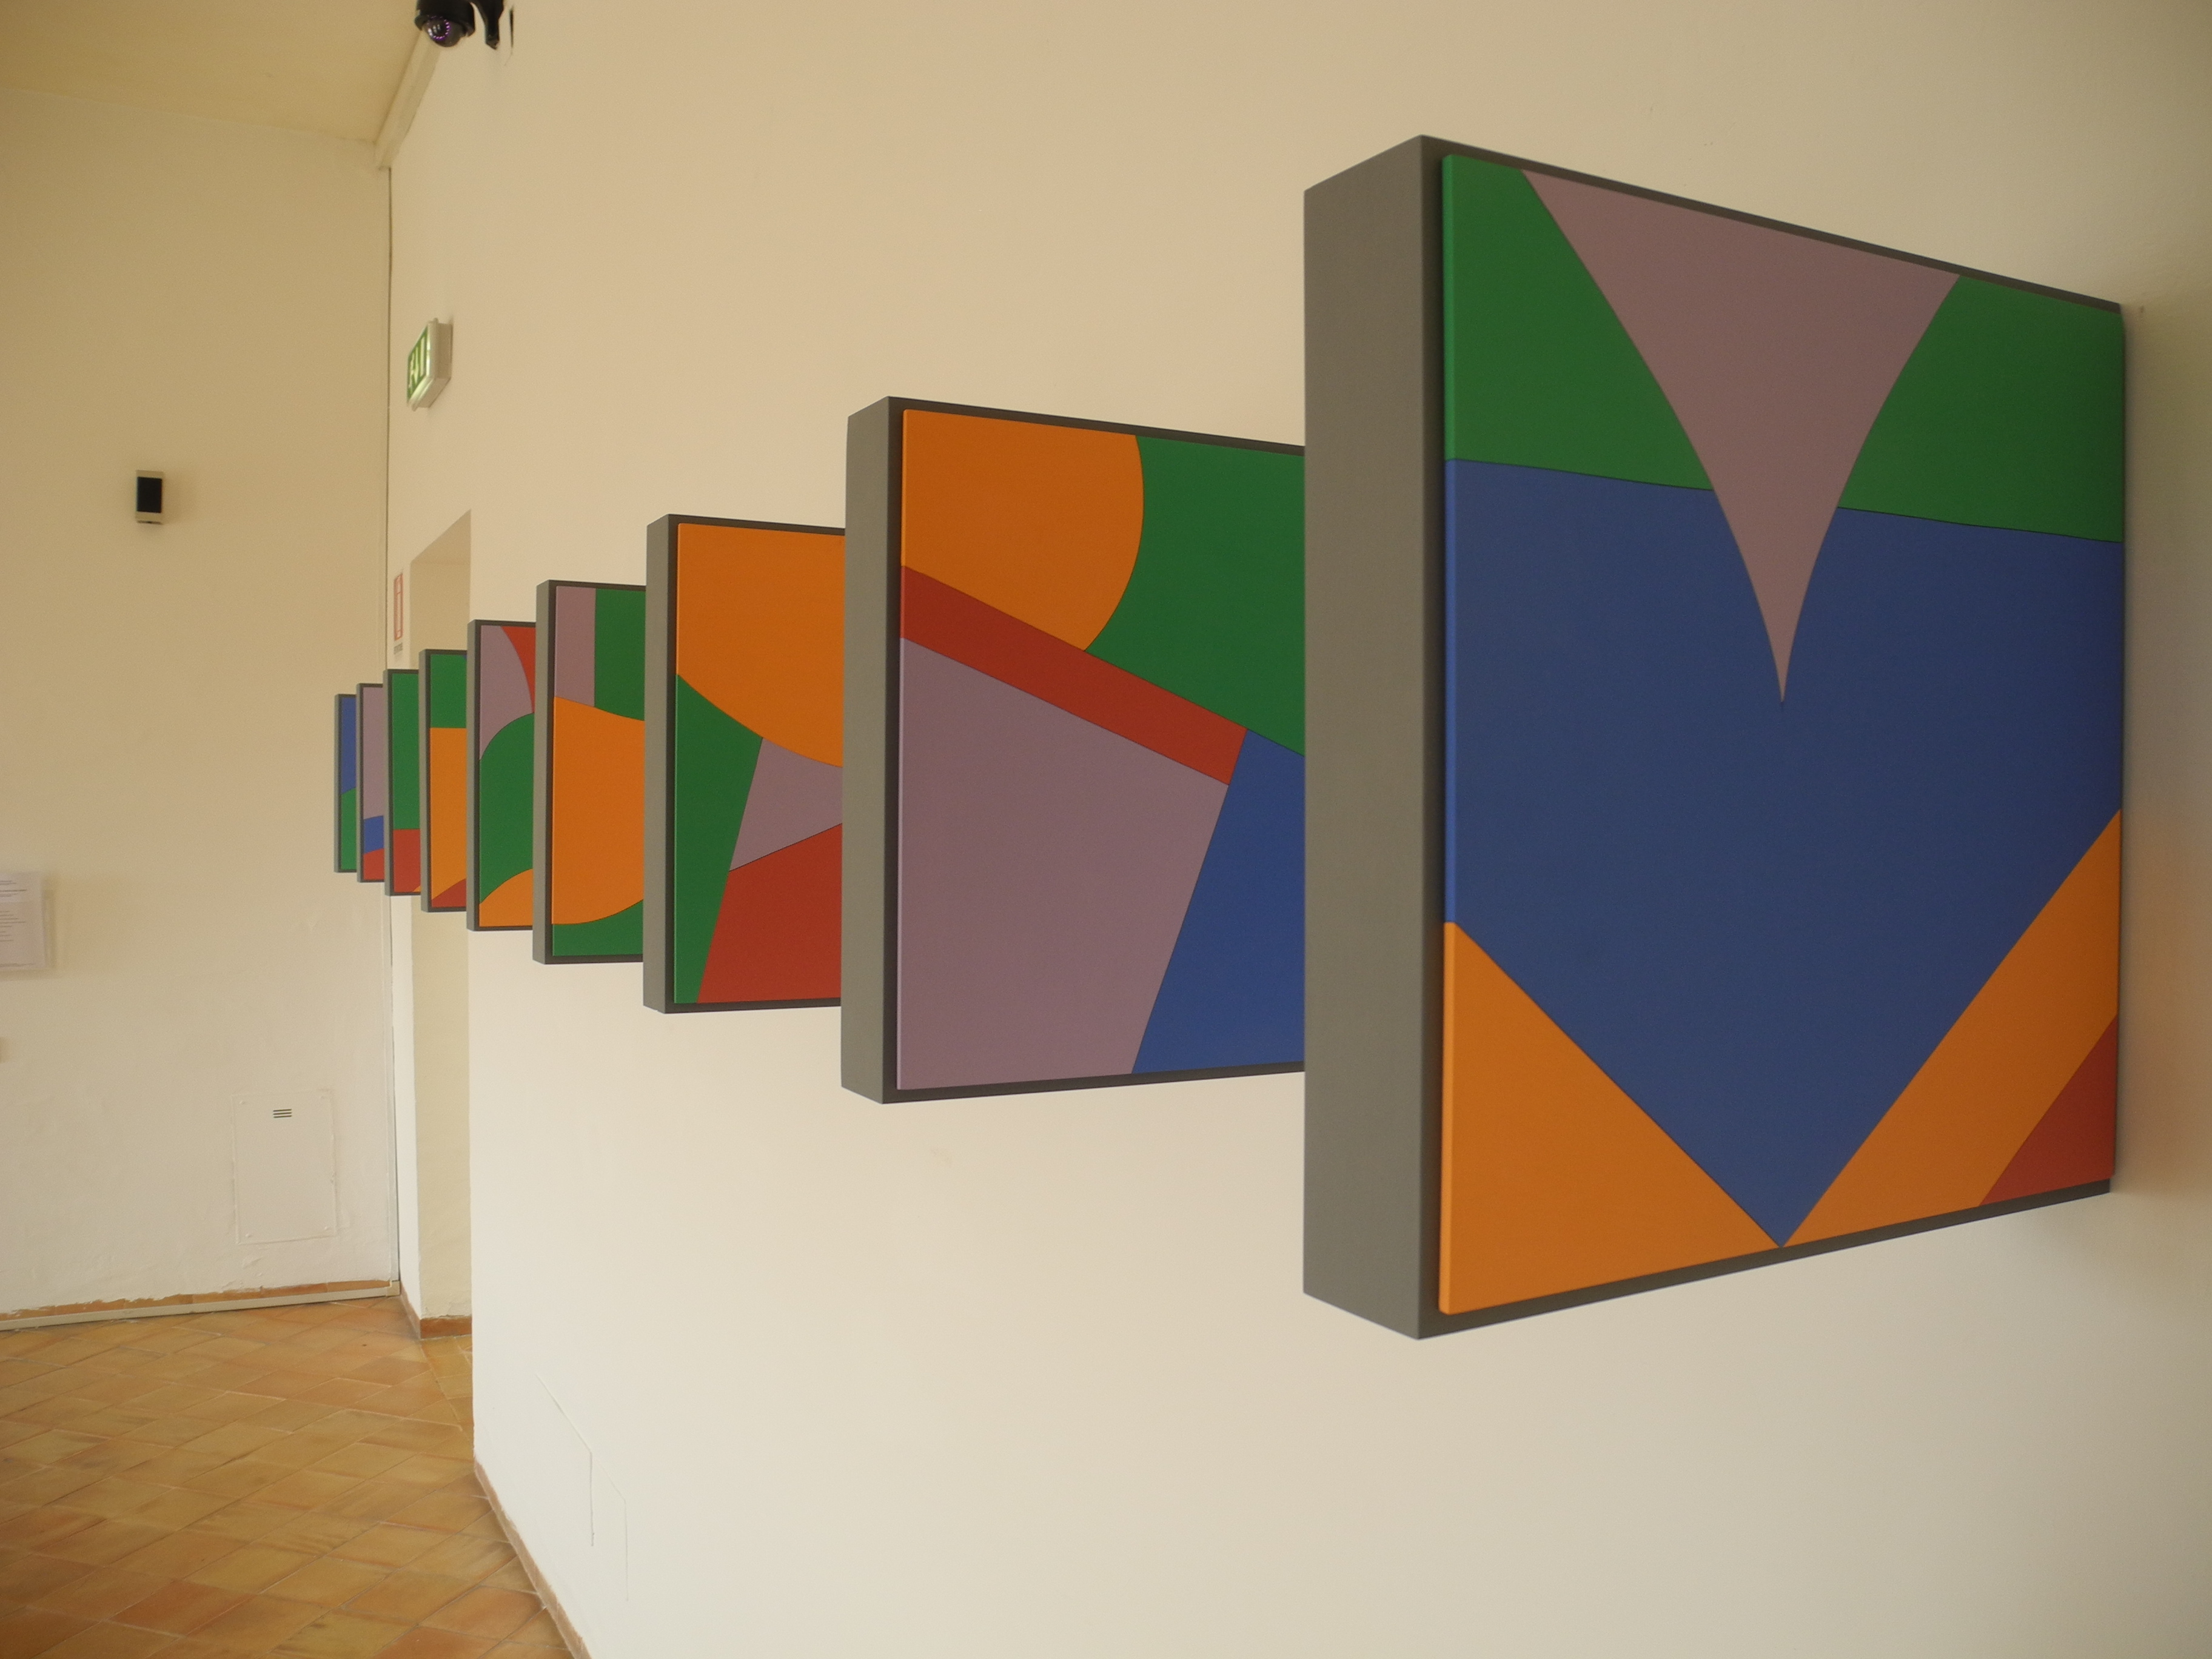 Impressioni futuriste 2, 2012